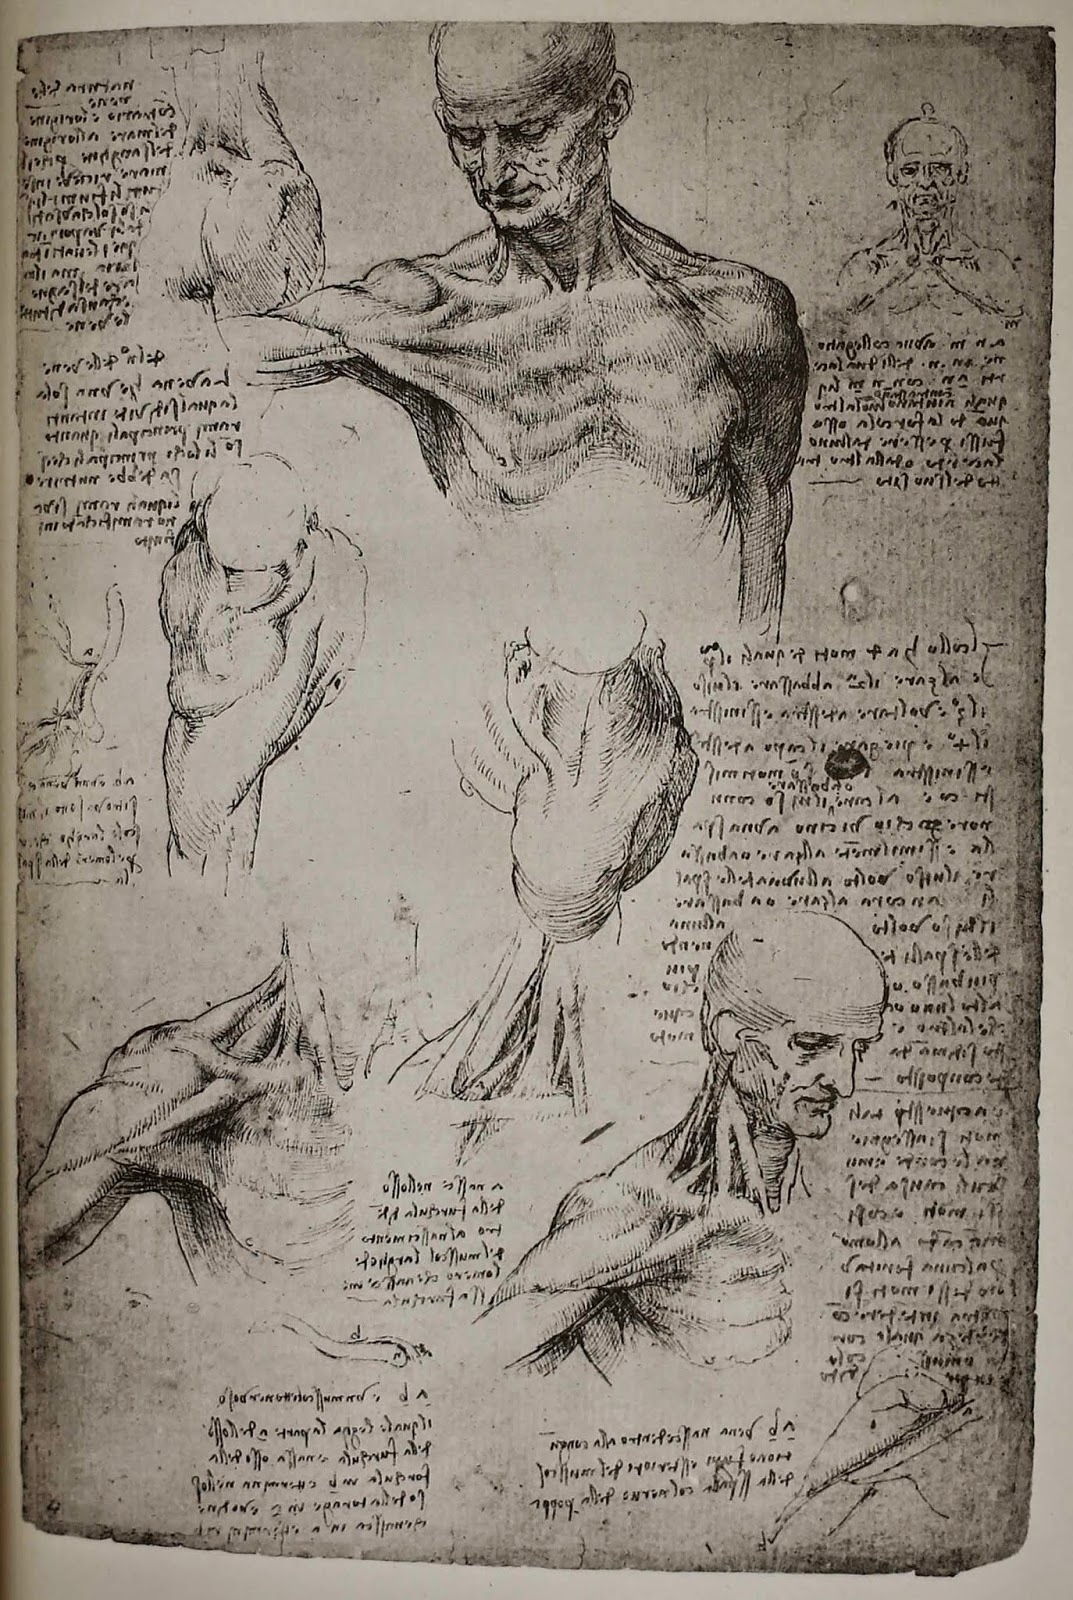 Brandeis Special Collections Spotlight: Leonardo da Vinci collection